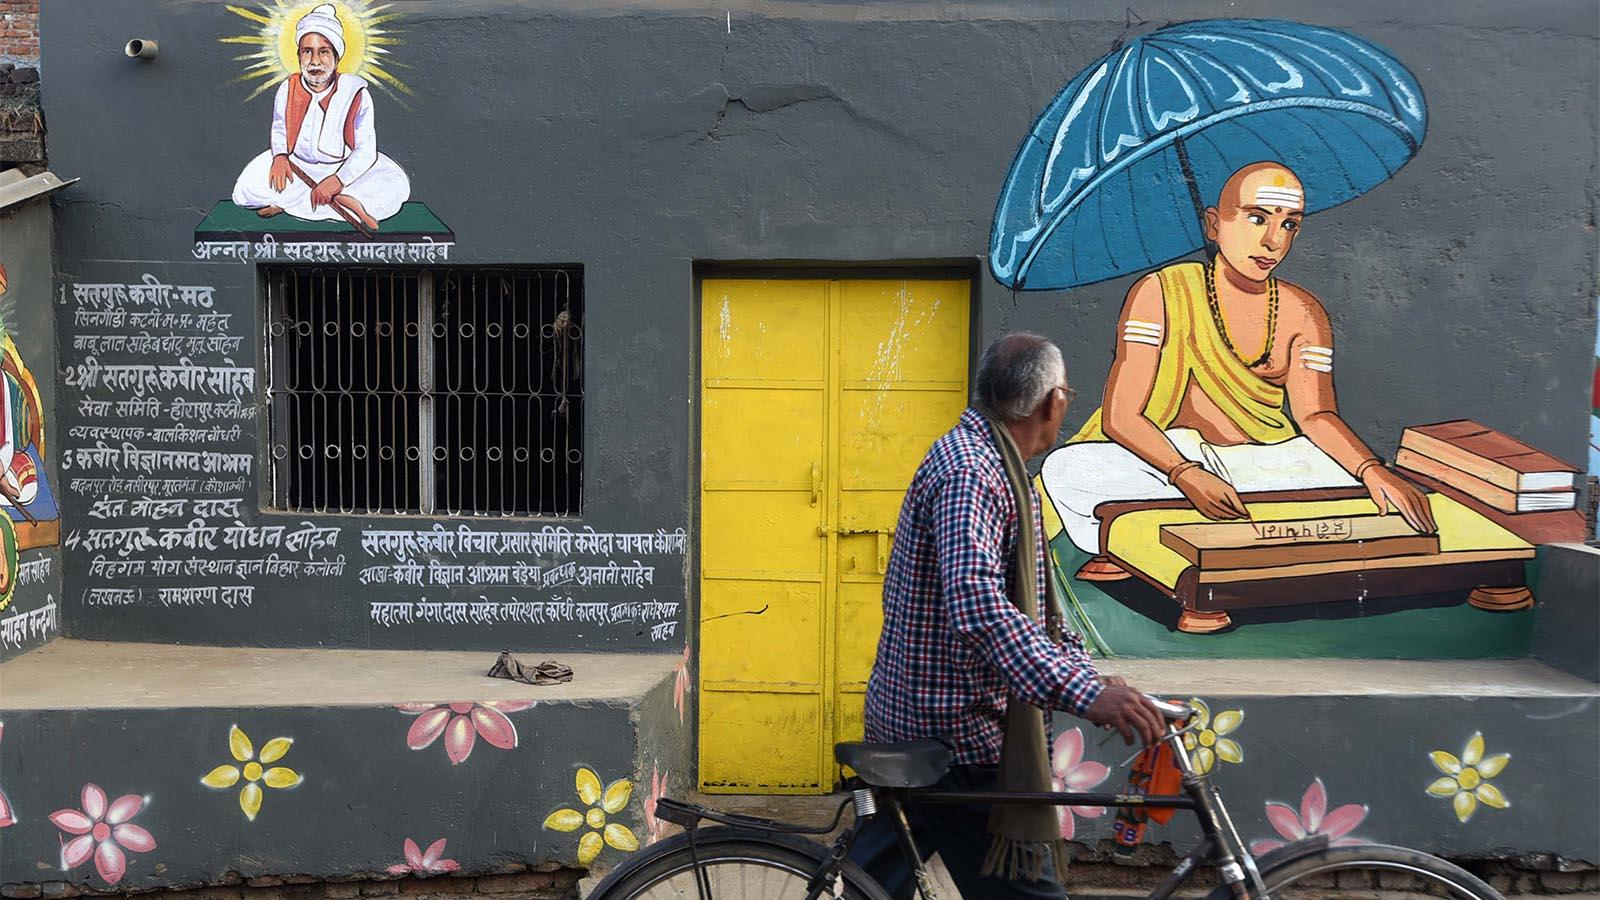 Art, life and spirituality converge at Kumbh